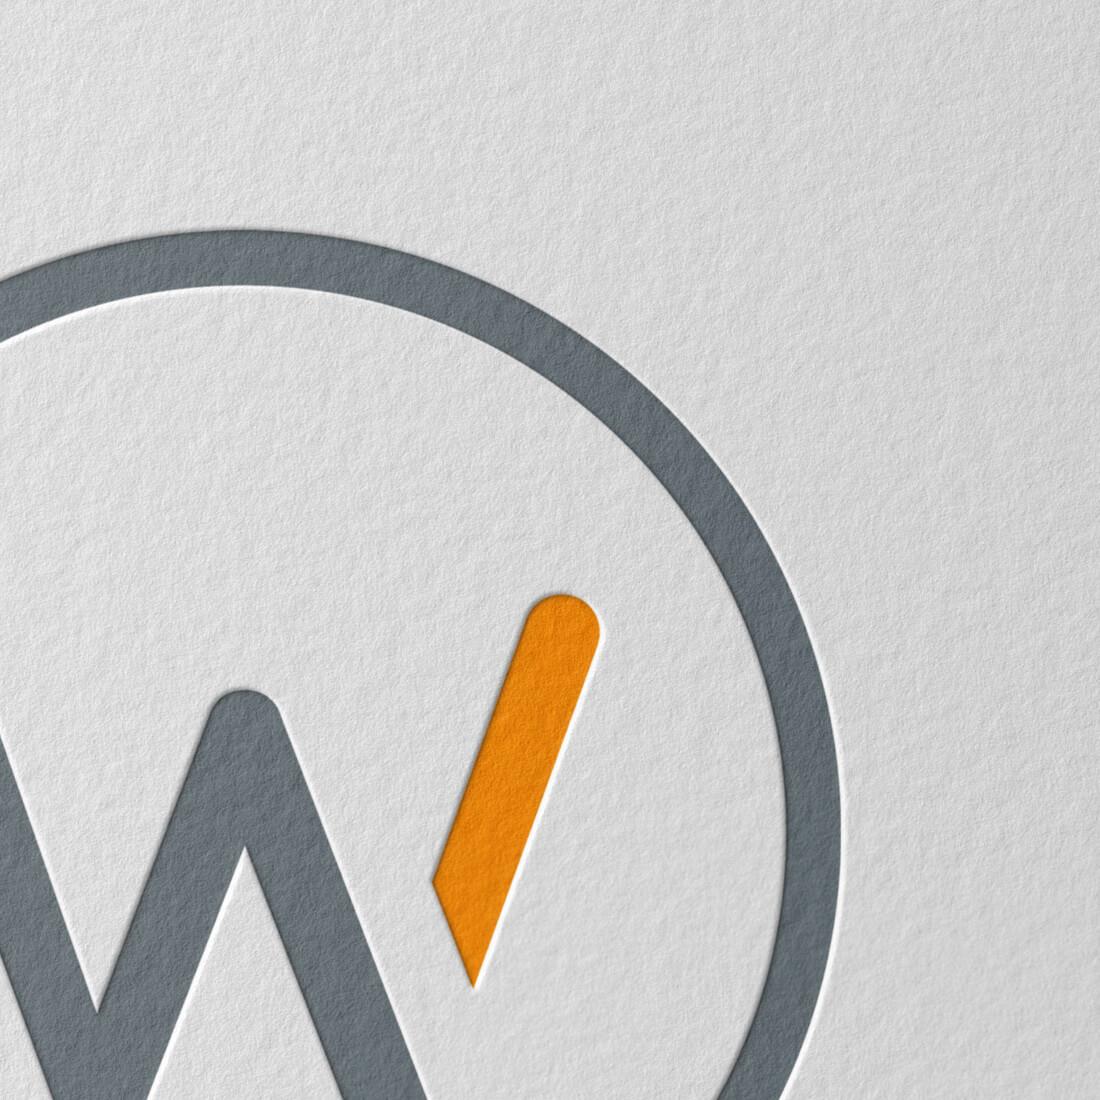 jalun design barbara tabery graphic design brochures logos web design german spanish valencia vienna